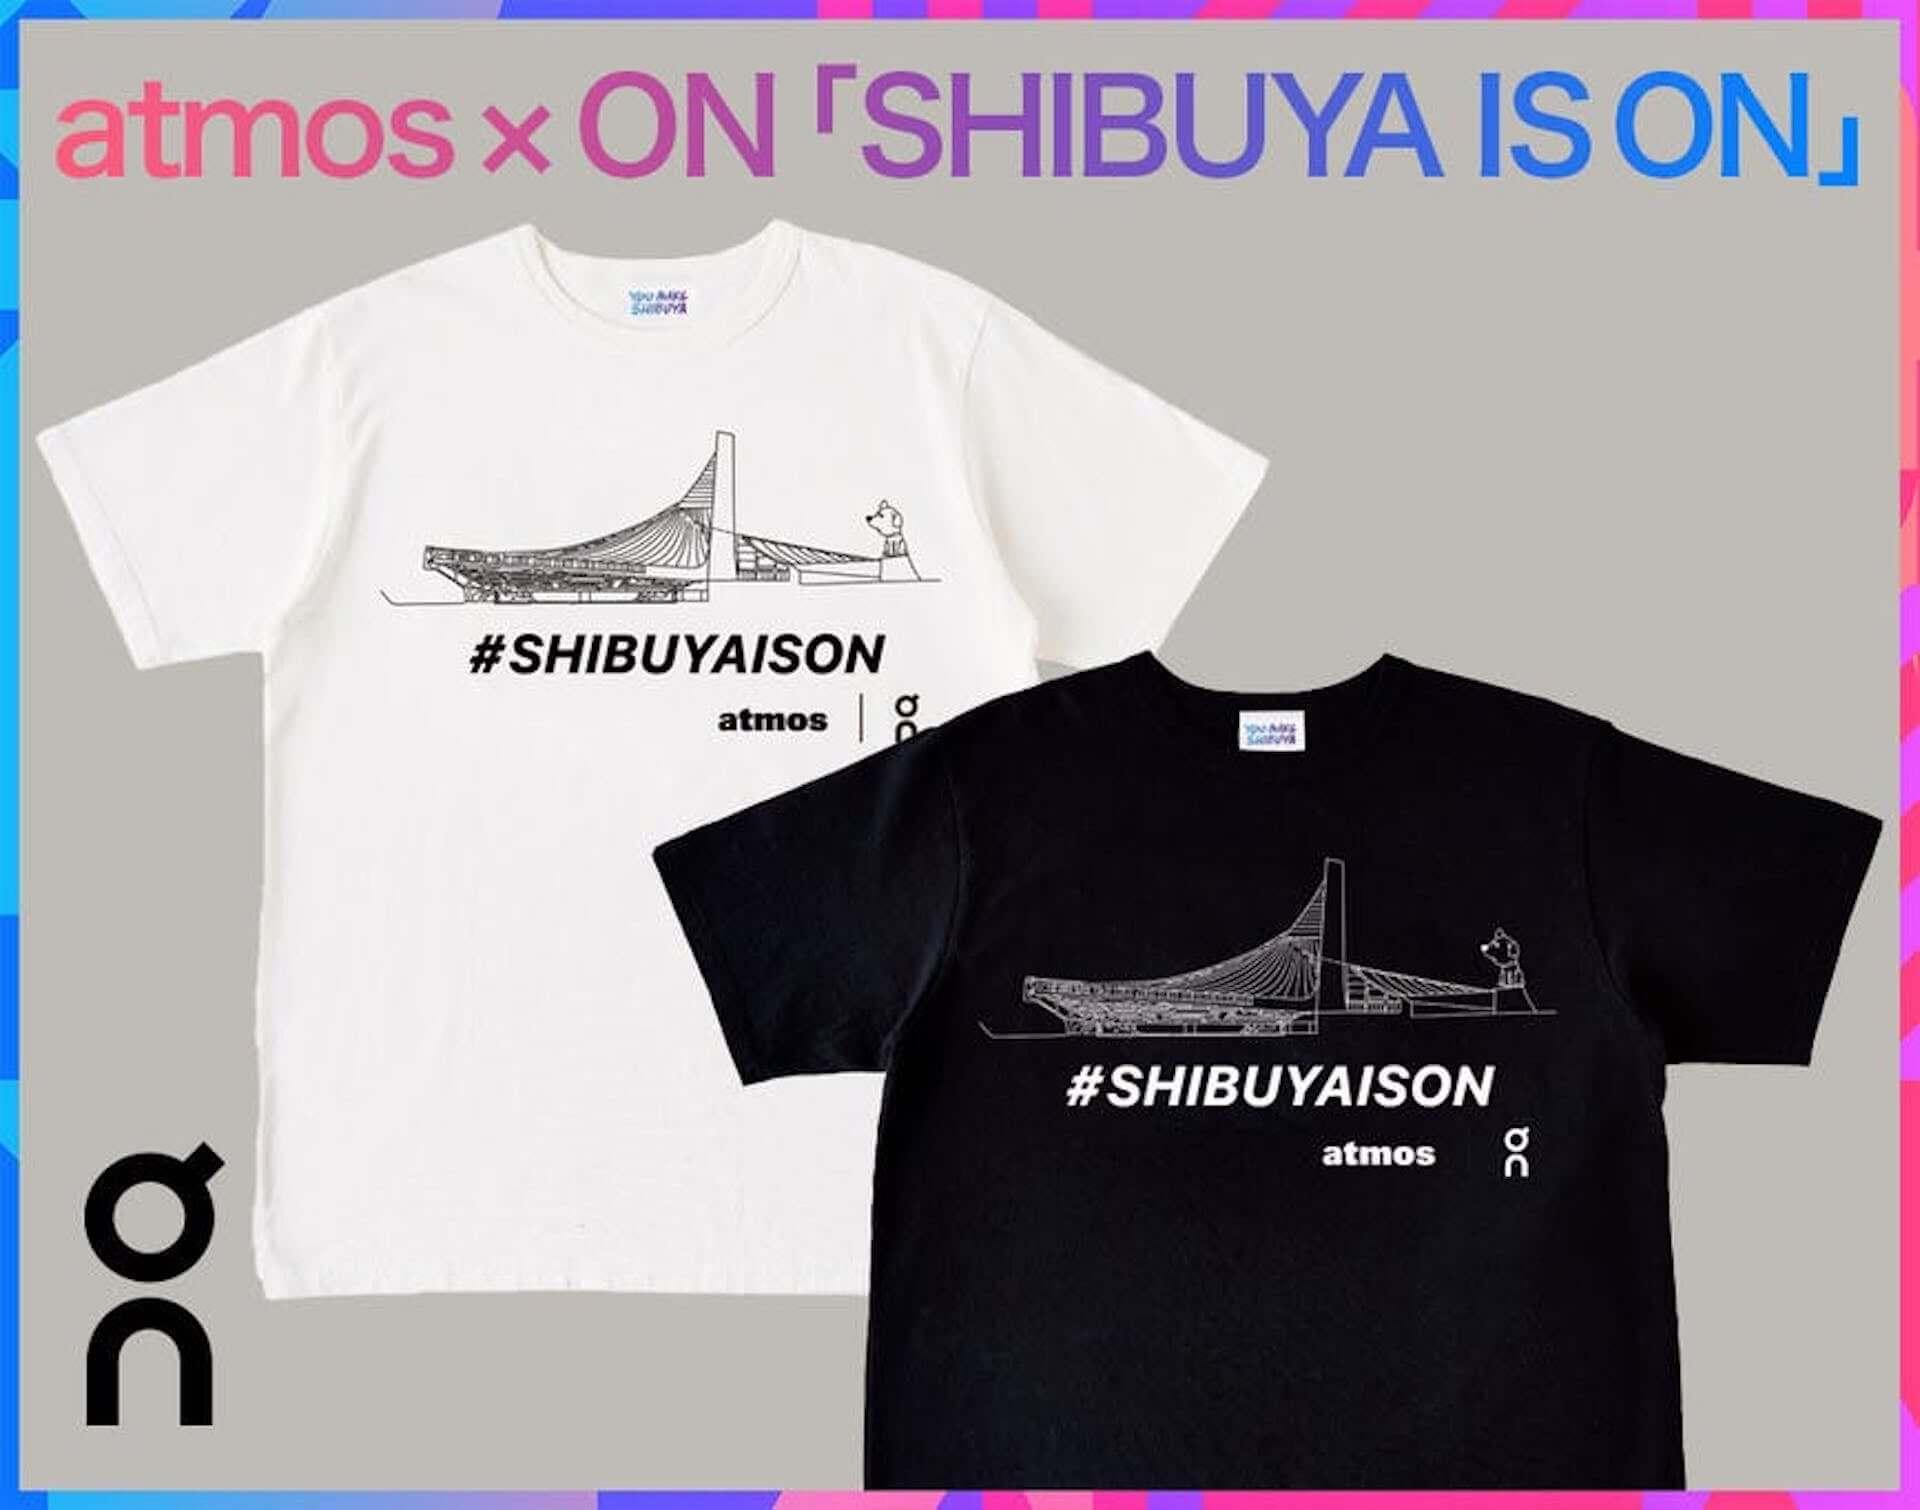 「YOU MAKE SHIBUYA クラウドファンディング」とKISS,TOKYO、atmos、EQUALAND、FR2がコラボ!リターンにTシャツ、フーディーなど多数登場 lf200805_youmakeshibuya_11-1920x1510